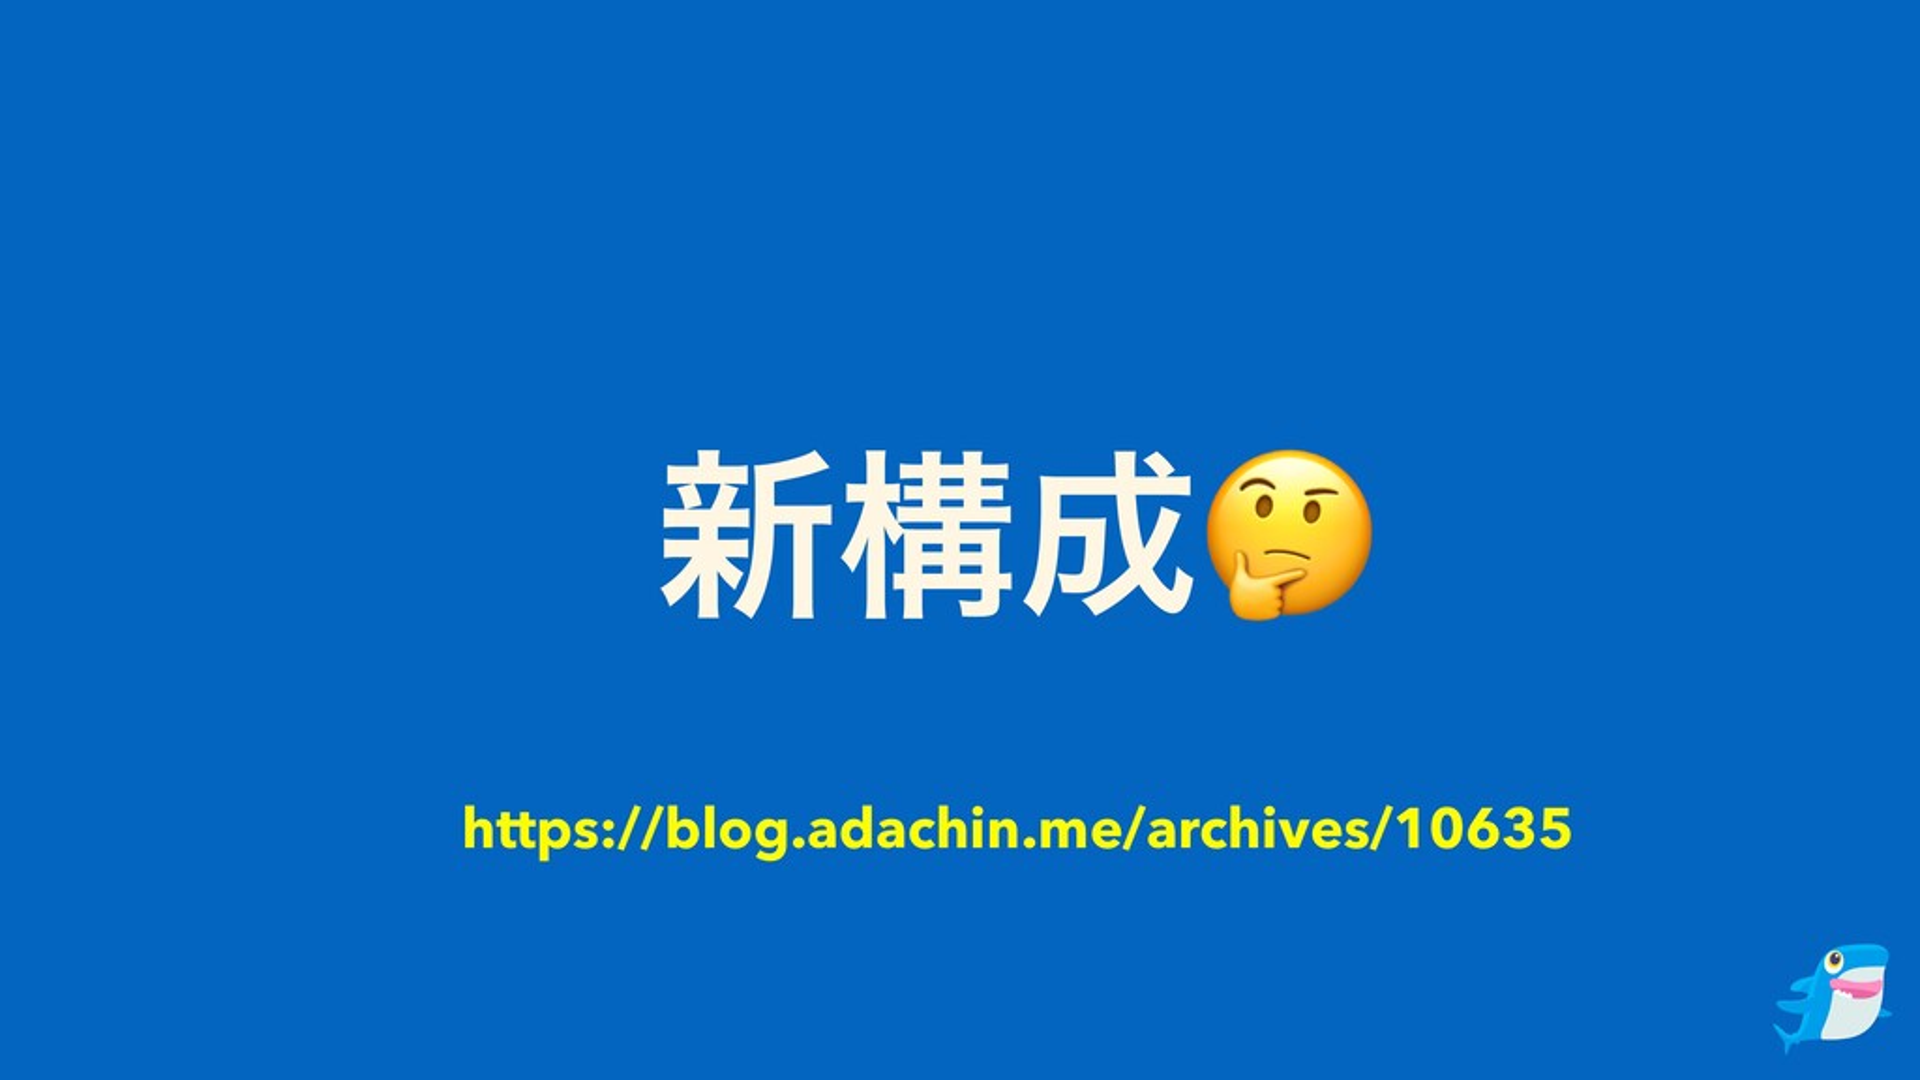 ৽ߏ https://blog.adachin.me/archives/10635